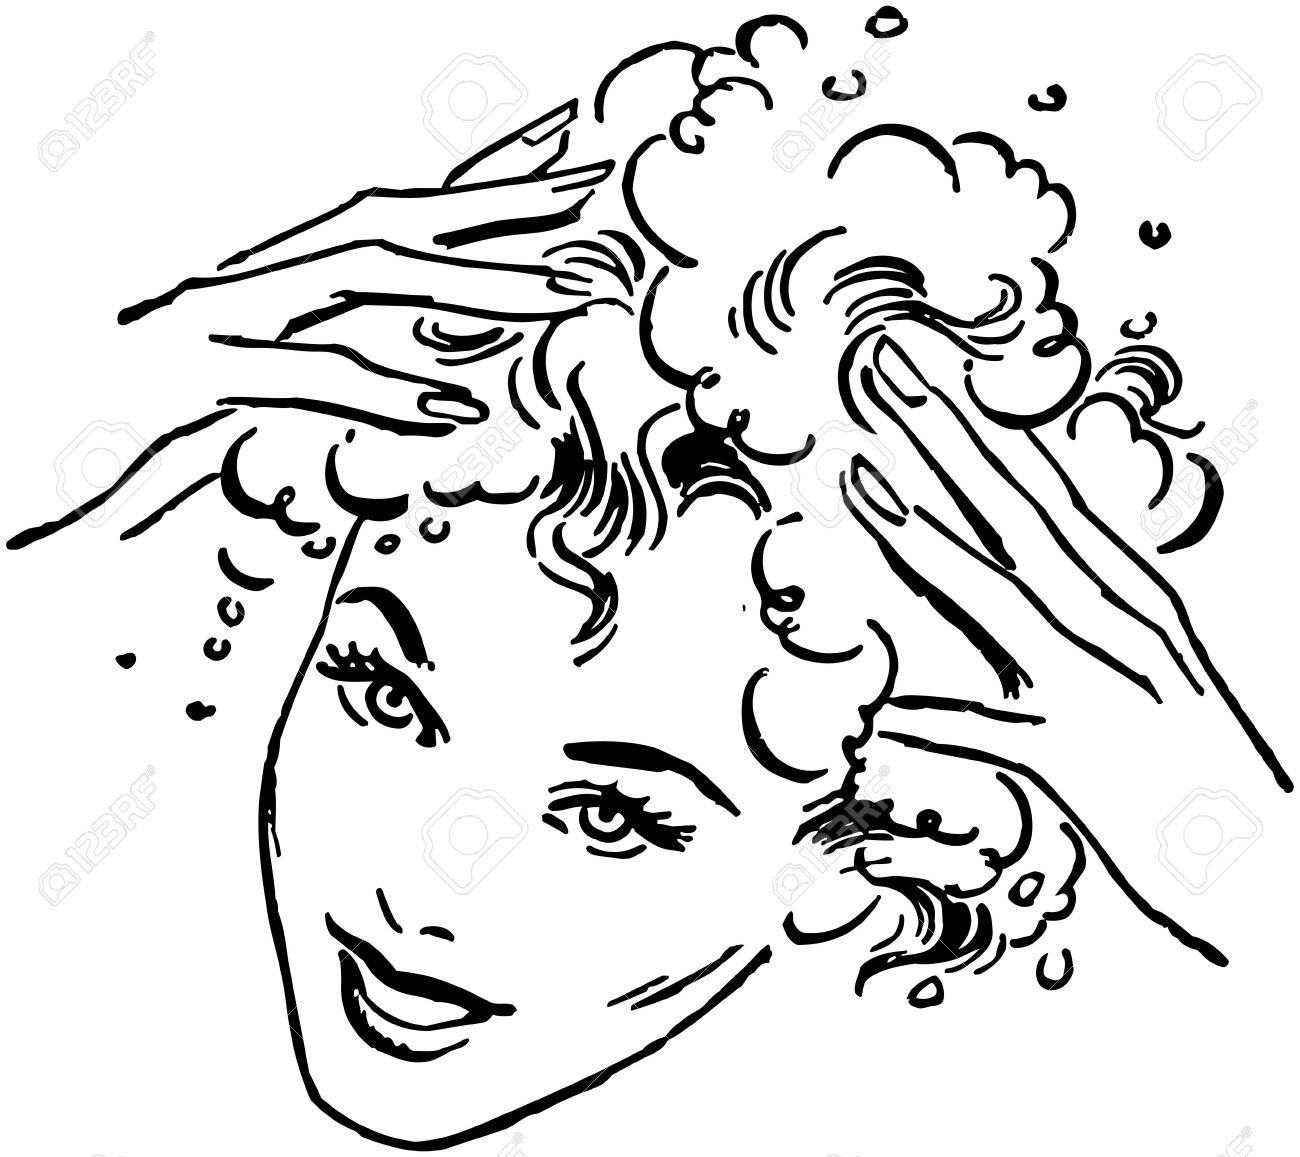 Haircut clipart hair hygiene. Stock vector stuff in